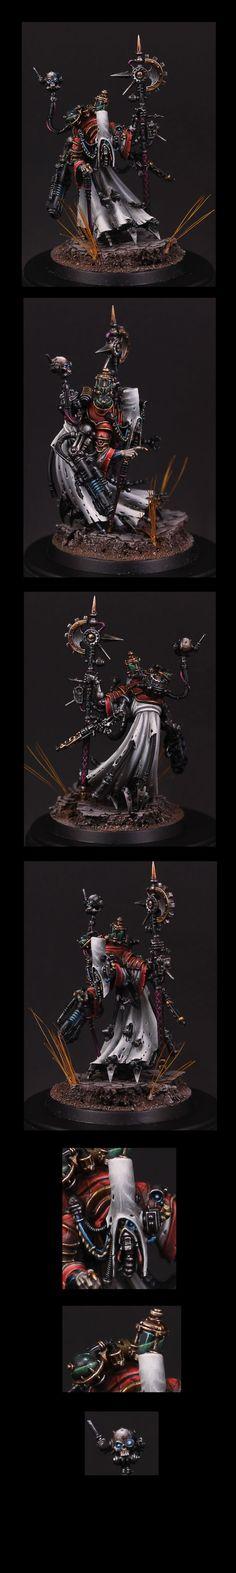 40k - Tech Priest Dominus by FrankenNerd